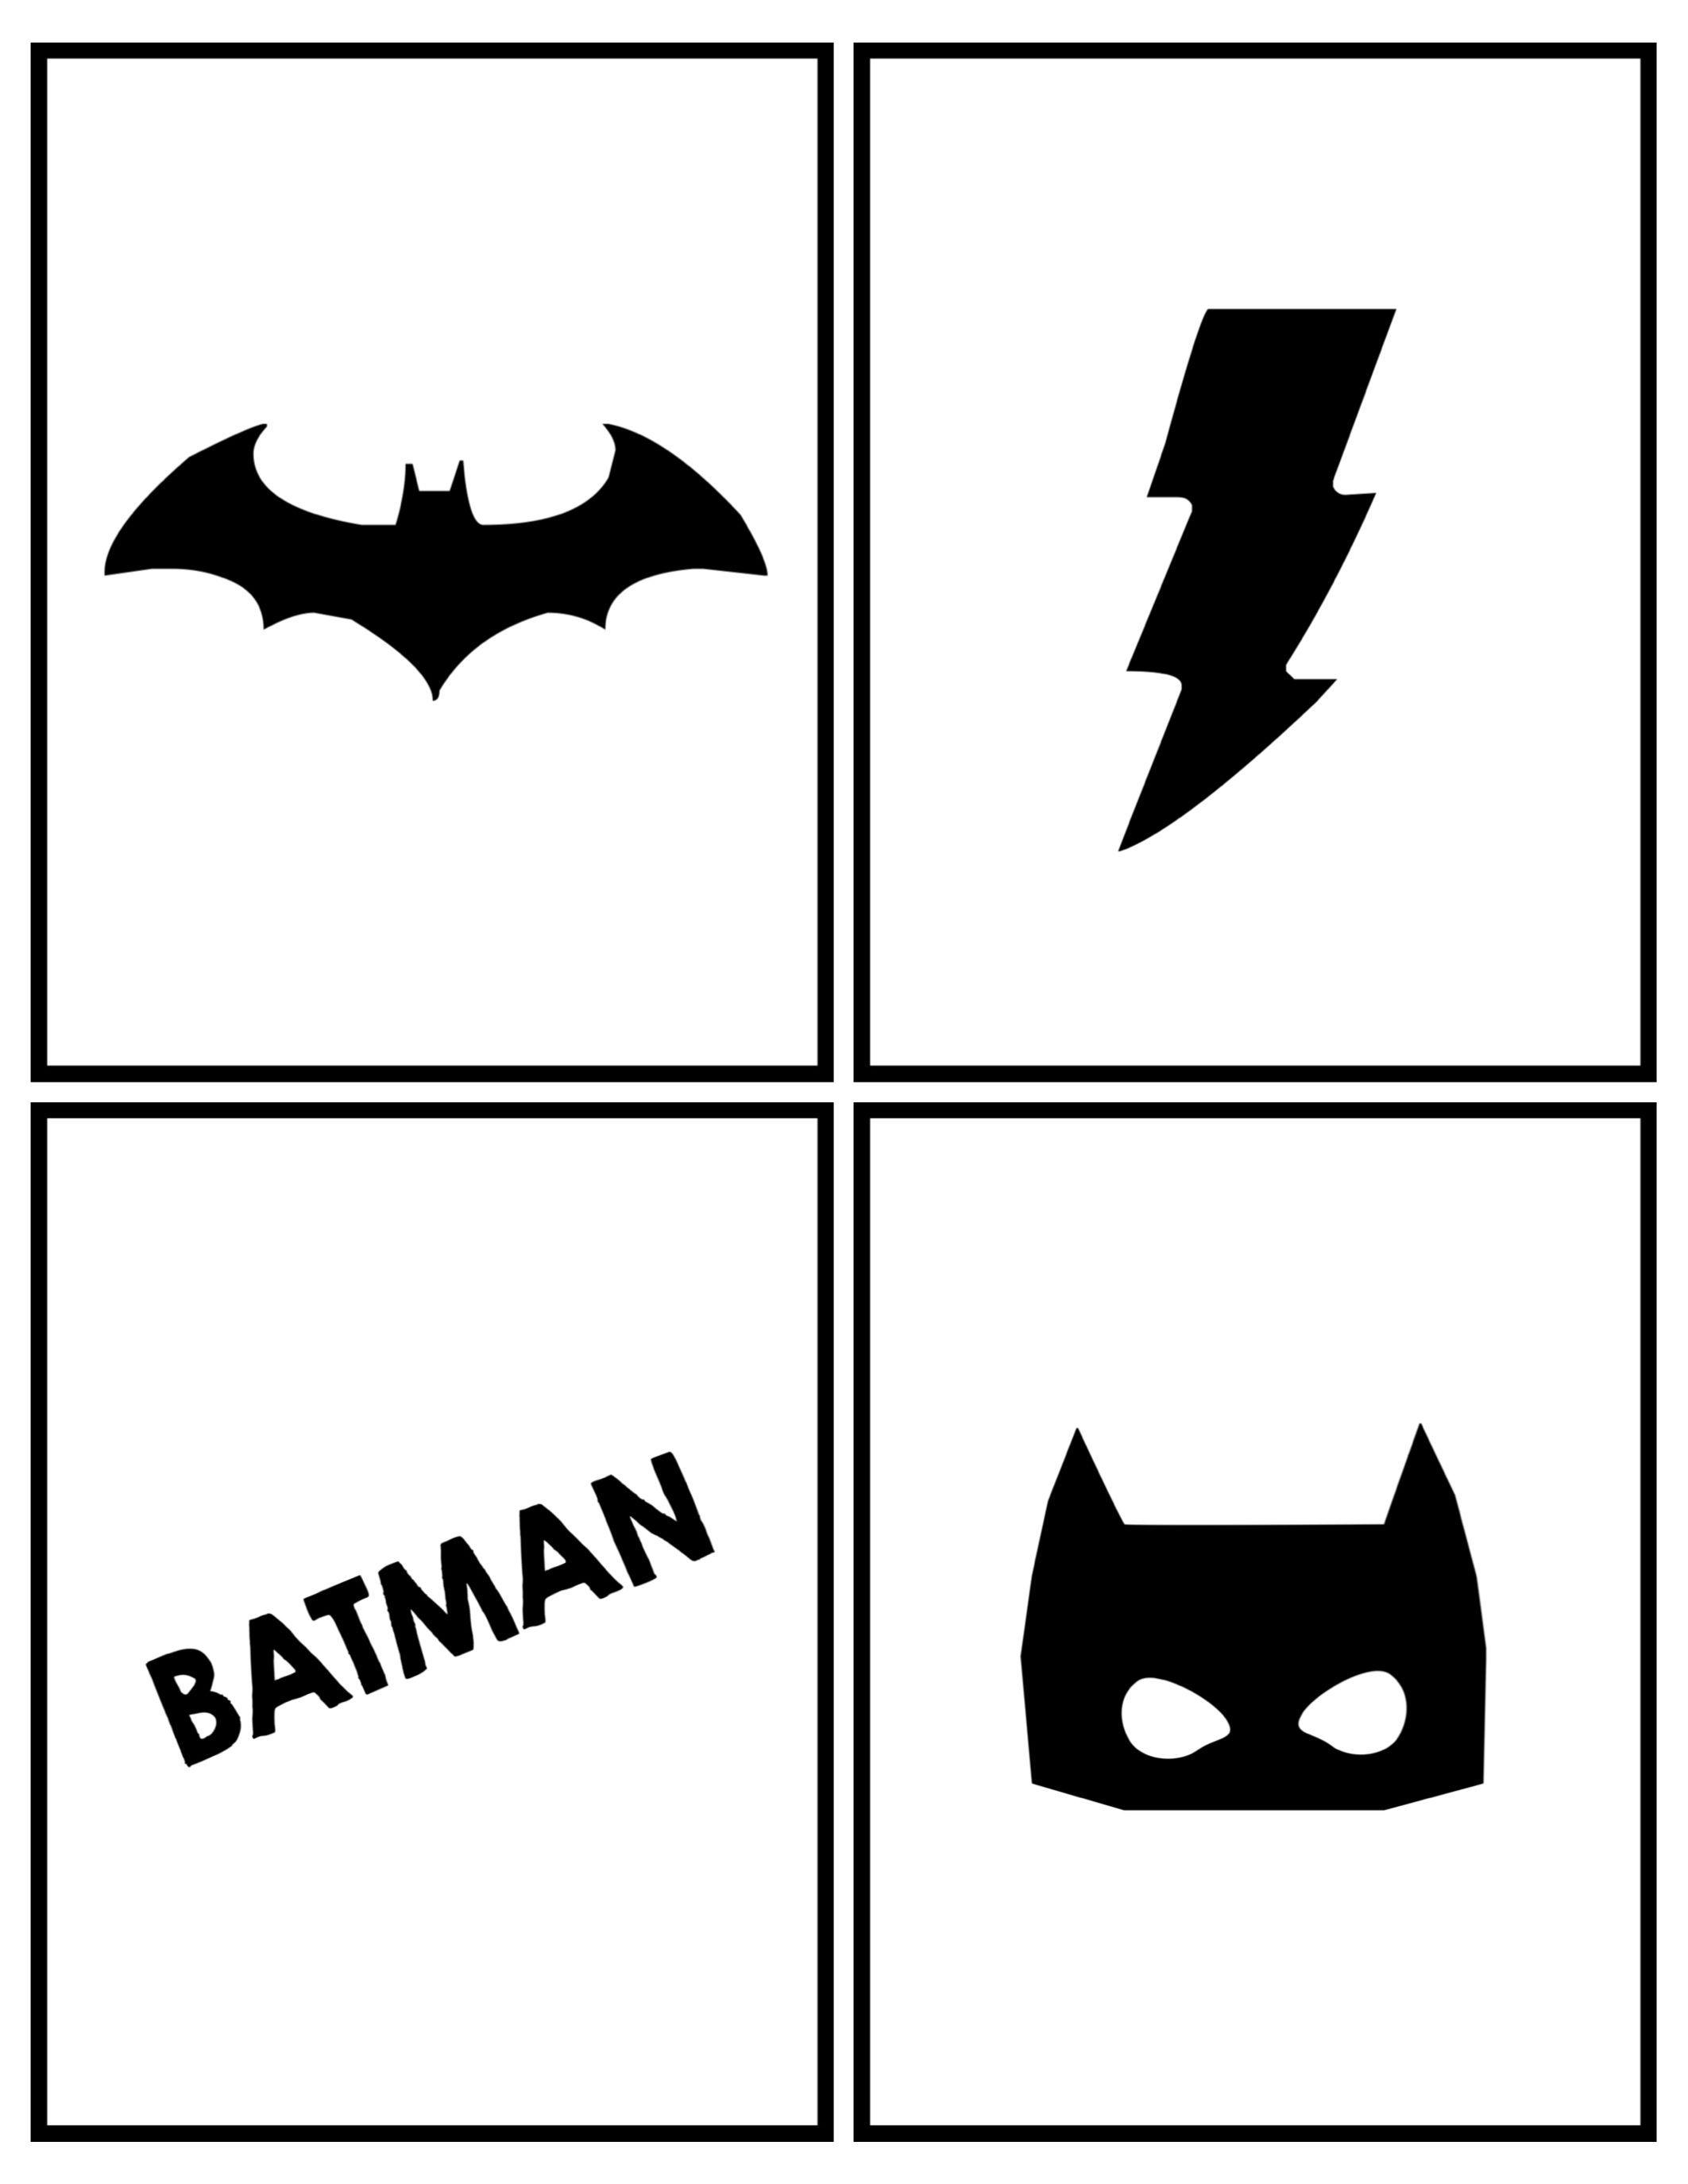 Batman Party Banner Free Printable | Batman party, Batman ...